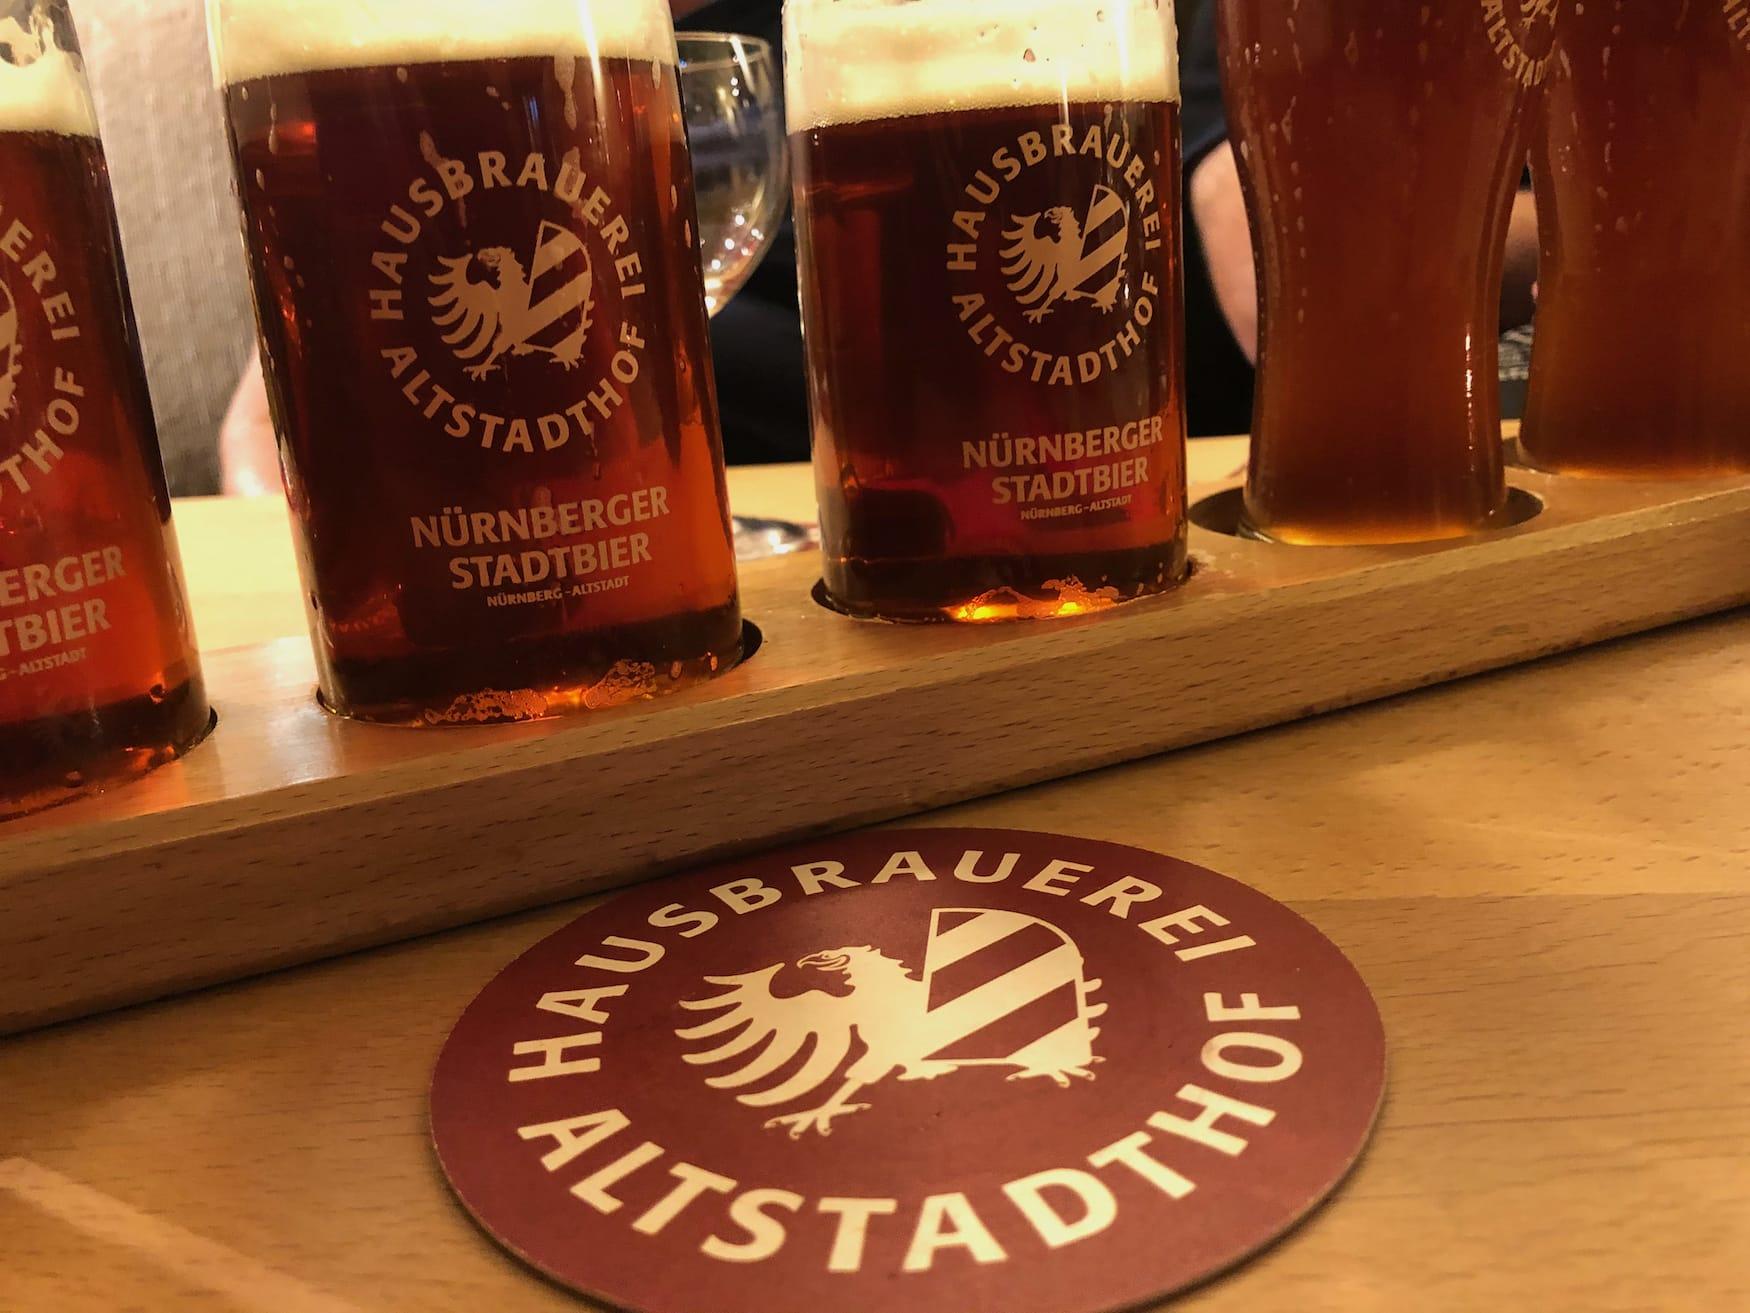 Craft Beer in einer der Brauereien in Europa, in der Hausbrauerei Altstadthof in Nürnberg